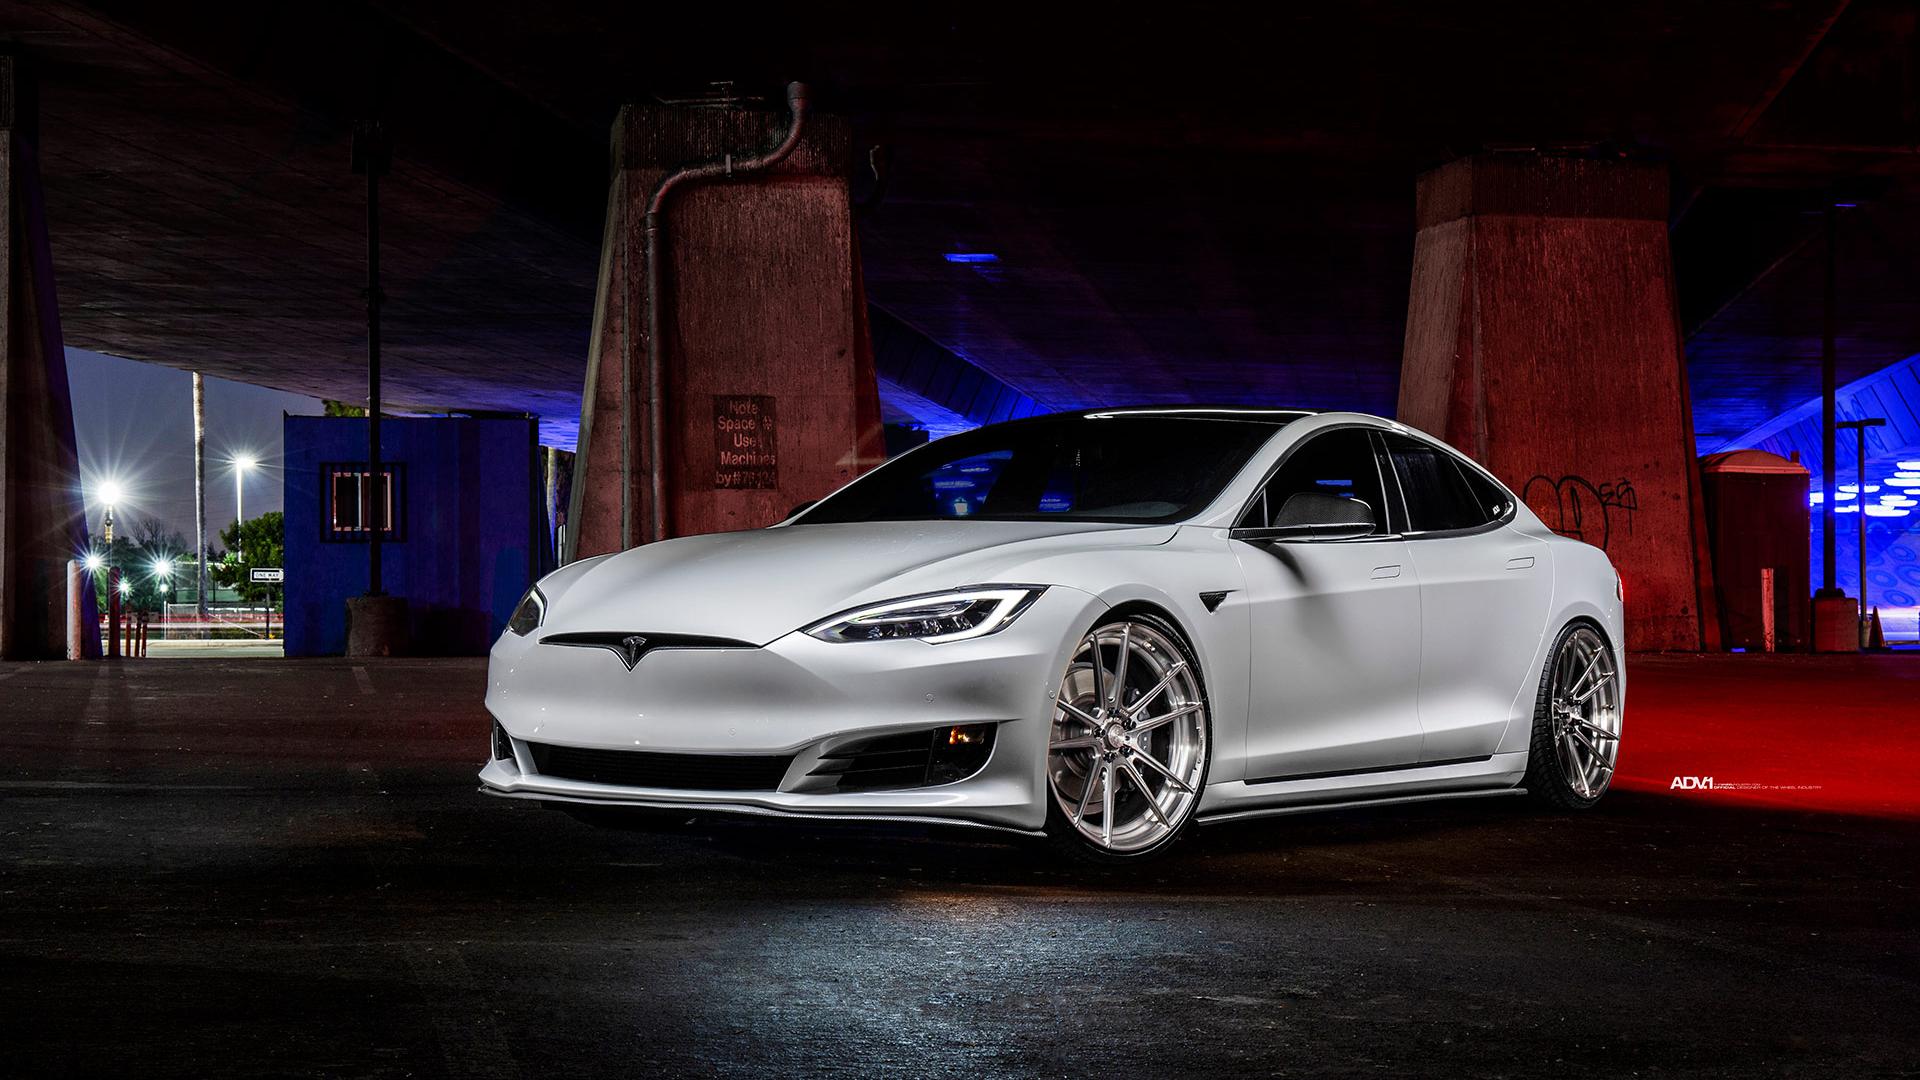 White Tesla Model S Wallpaper Hd Car Wallpapers Id 10967